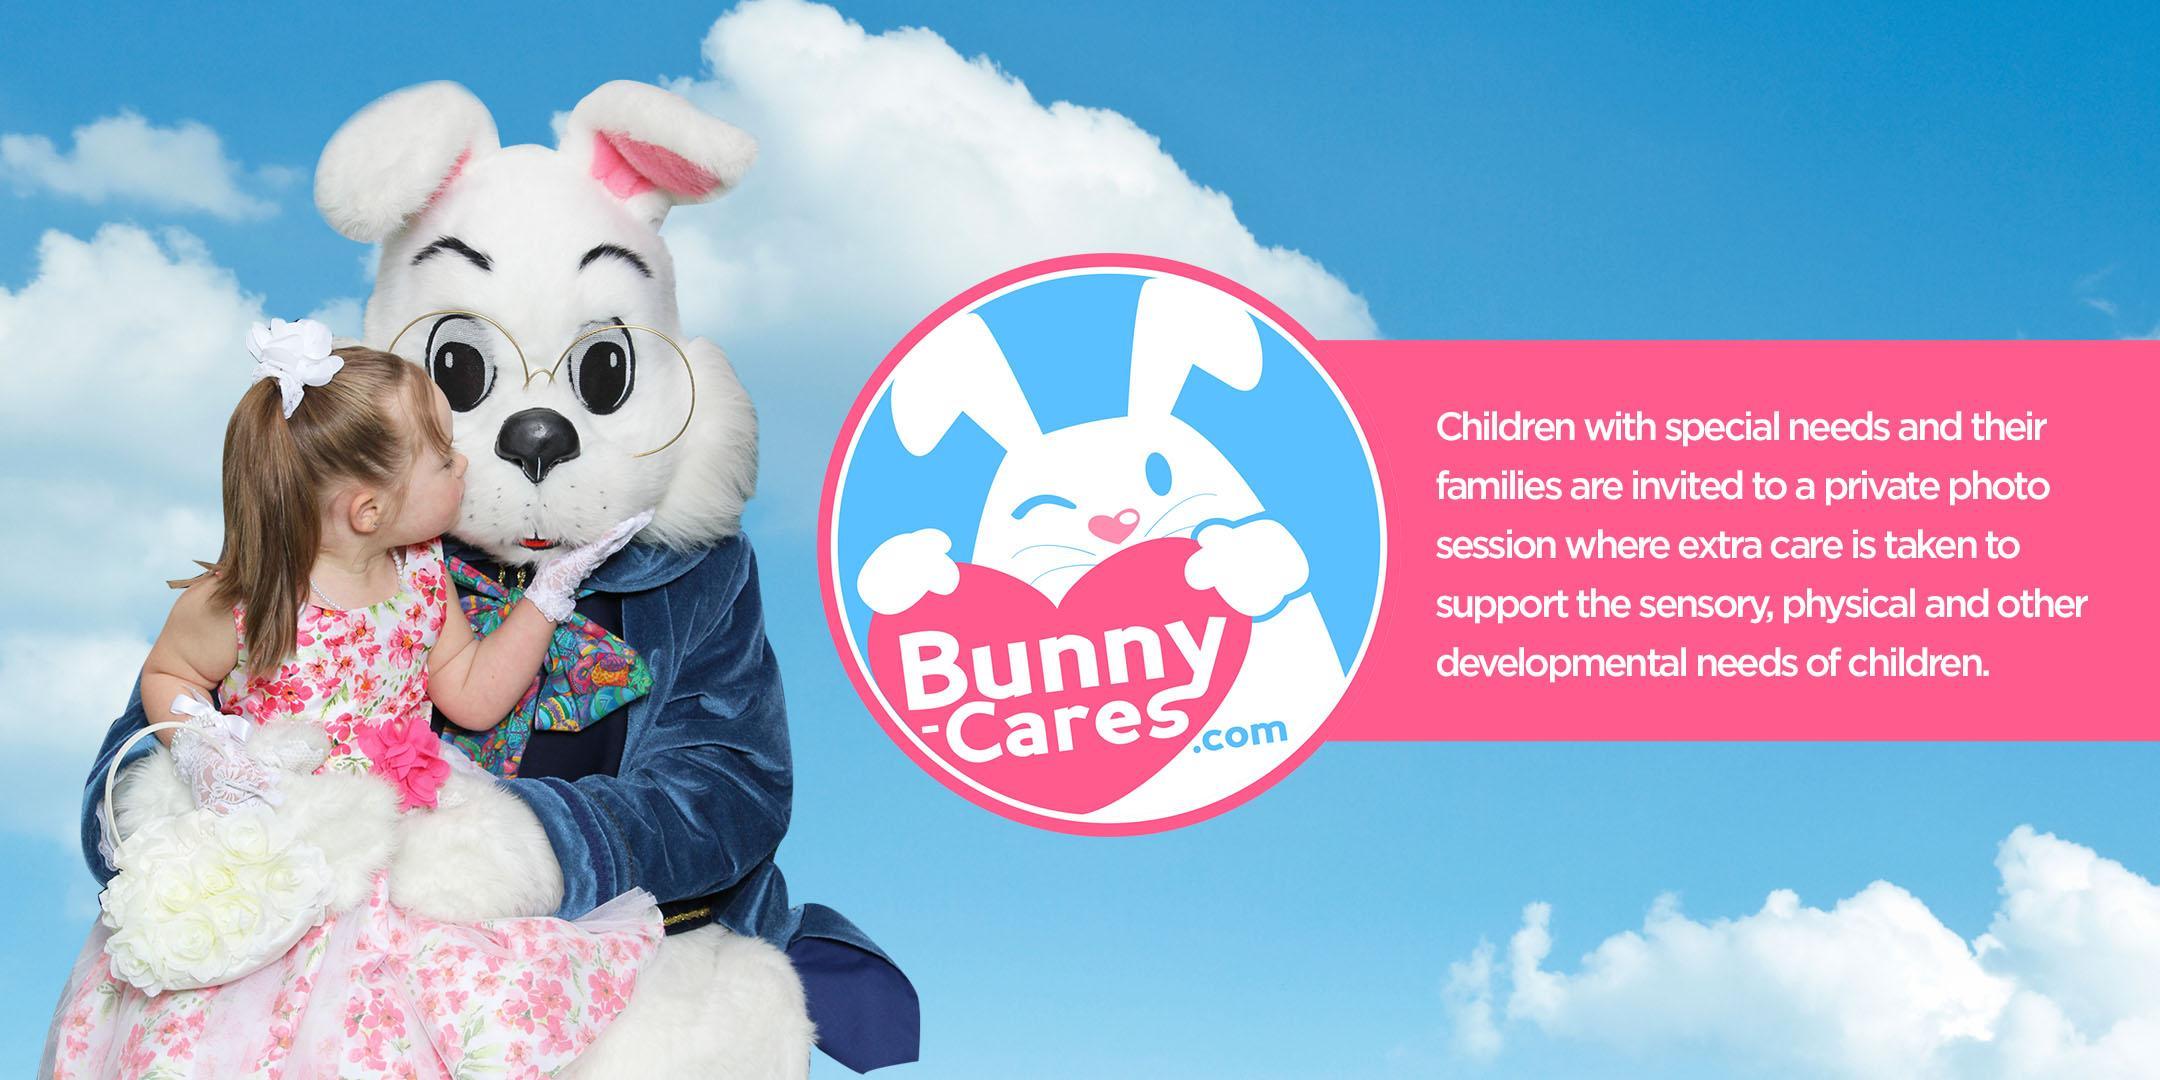 Palisades Center - Bunny Cares